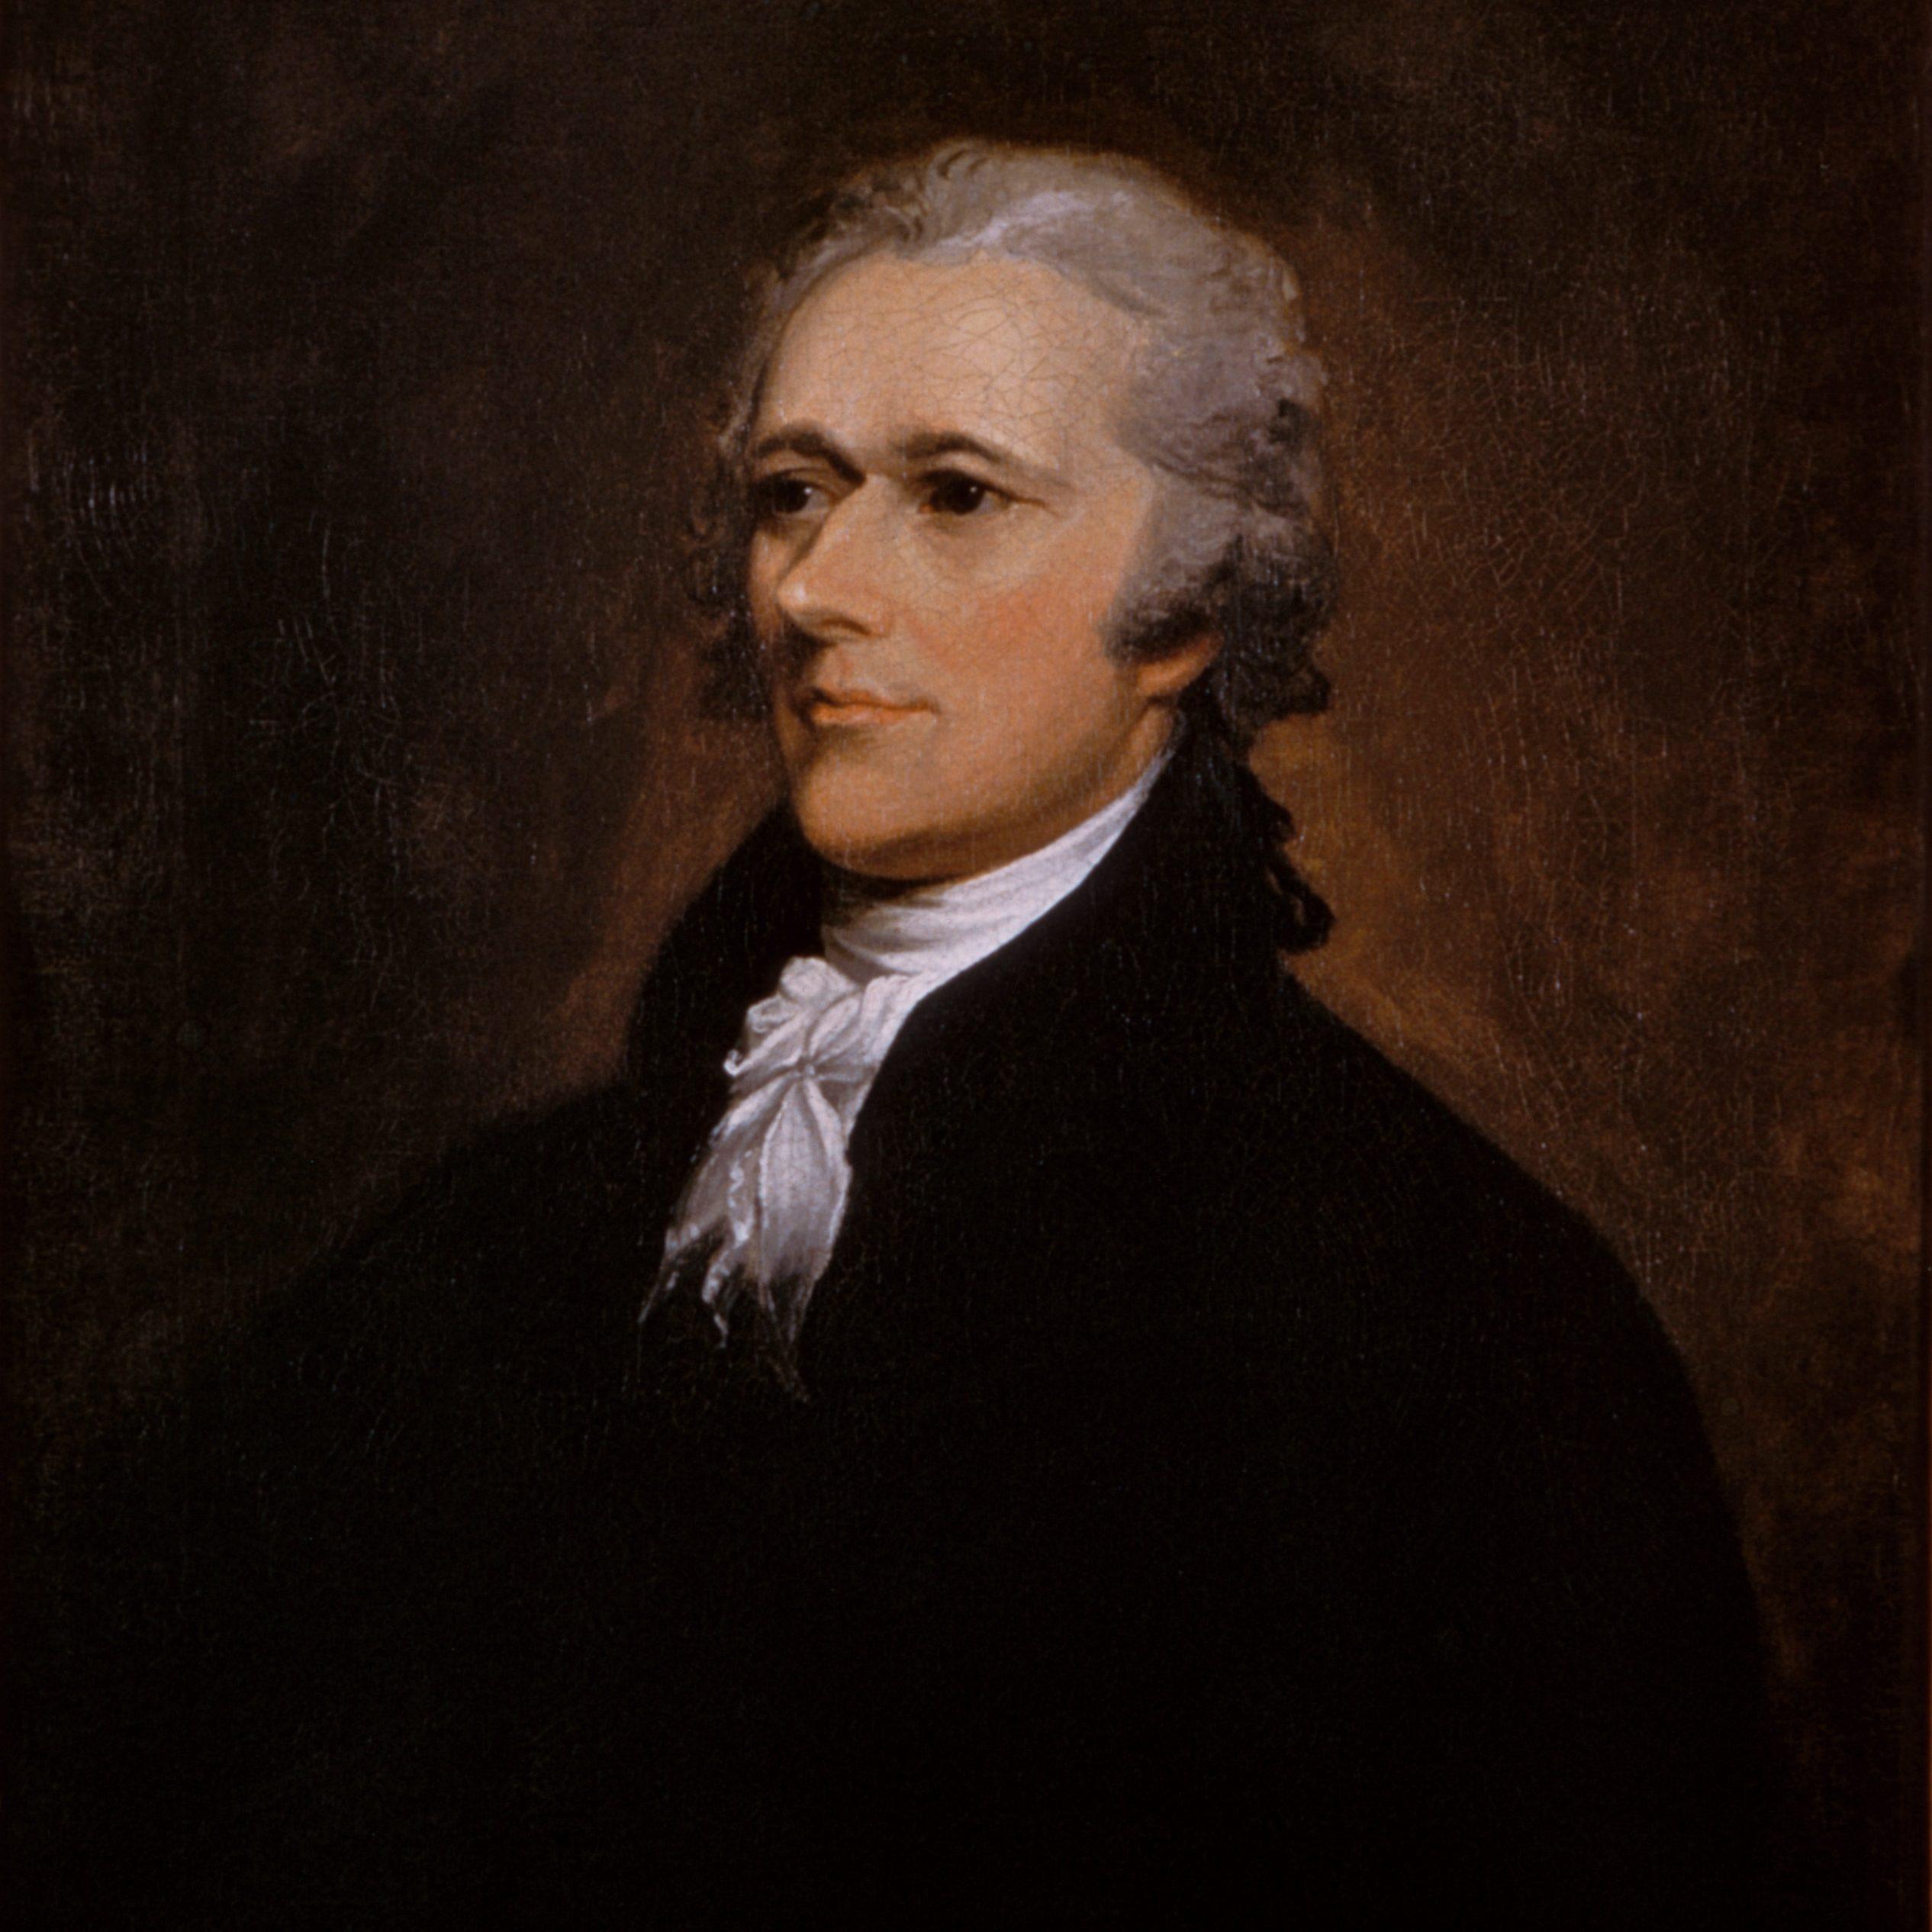 Portrait of Alexander Hamilton - Banking Law - Eric Everett Hawes